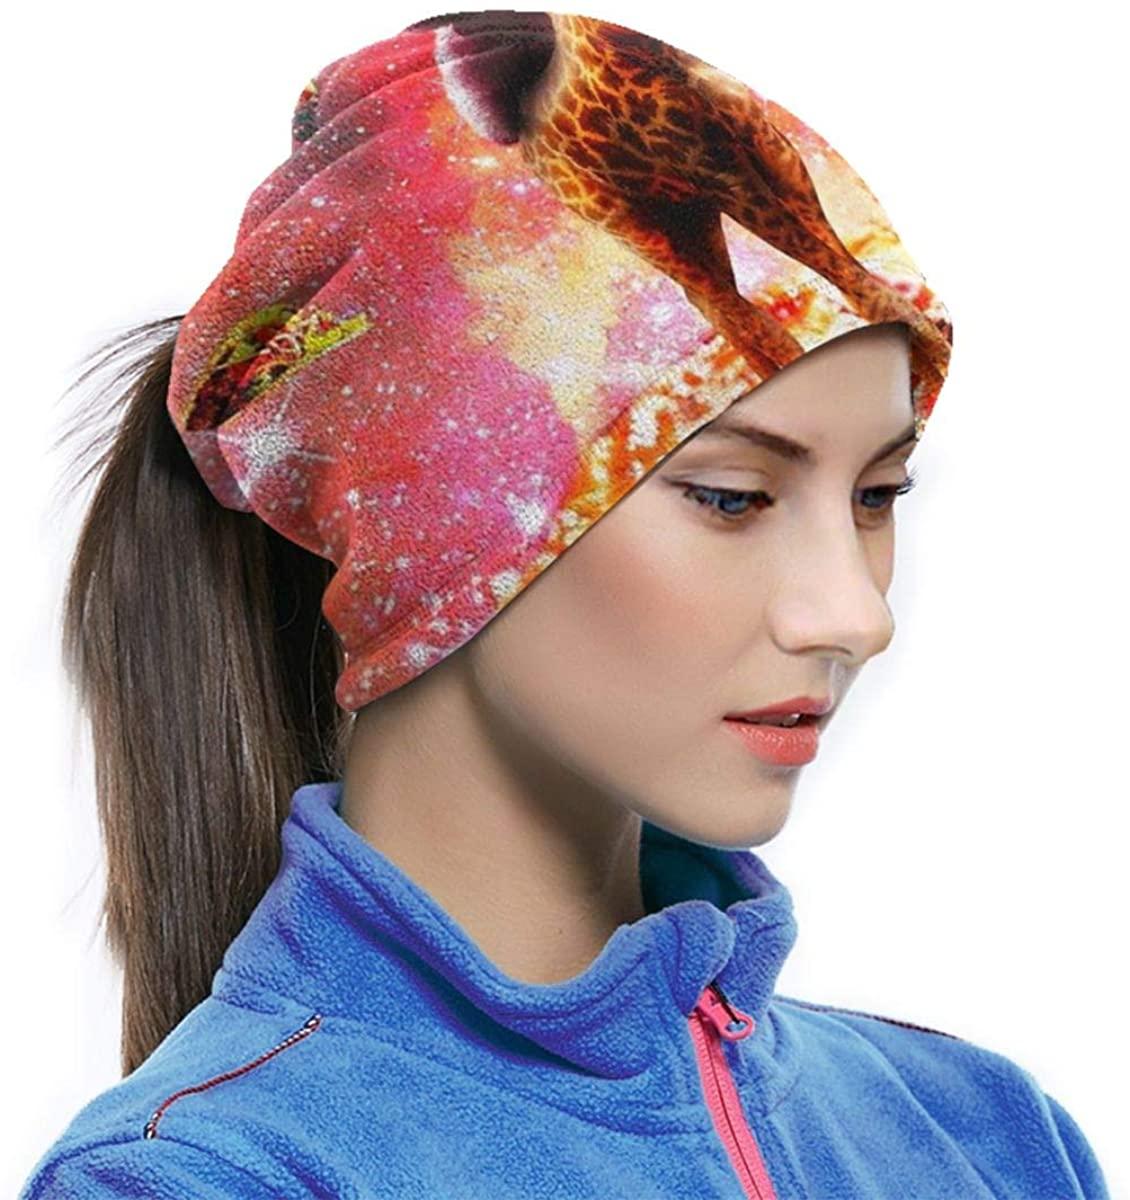 Space Sloth Riding Giraffe Unicorn Pizza Taco Unisex Neck Warmer Gaiter Balaclava Ski Mask Cold Weather Face Mask Winter Hats Headwear For Men Women